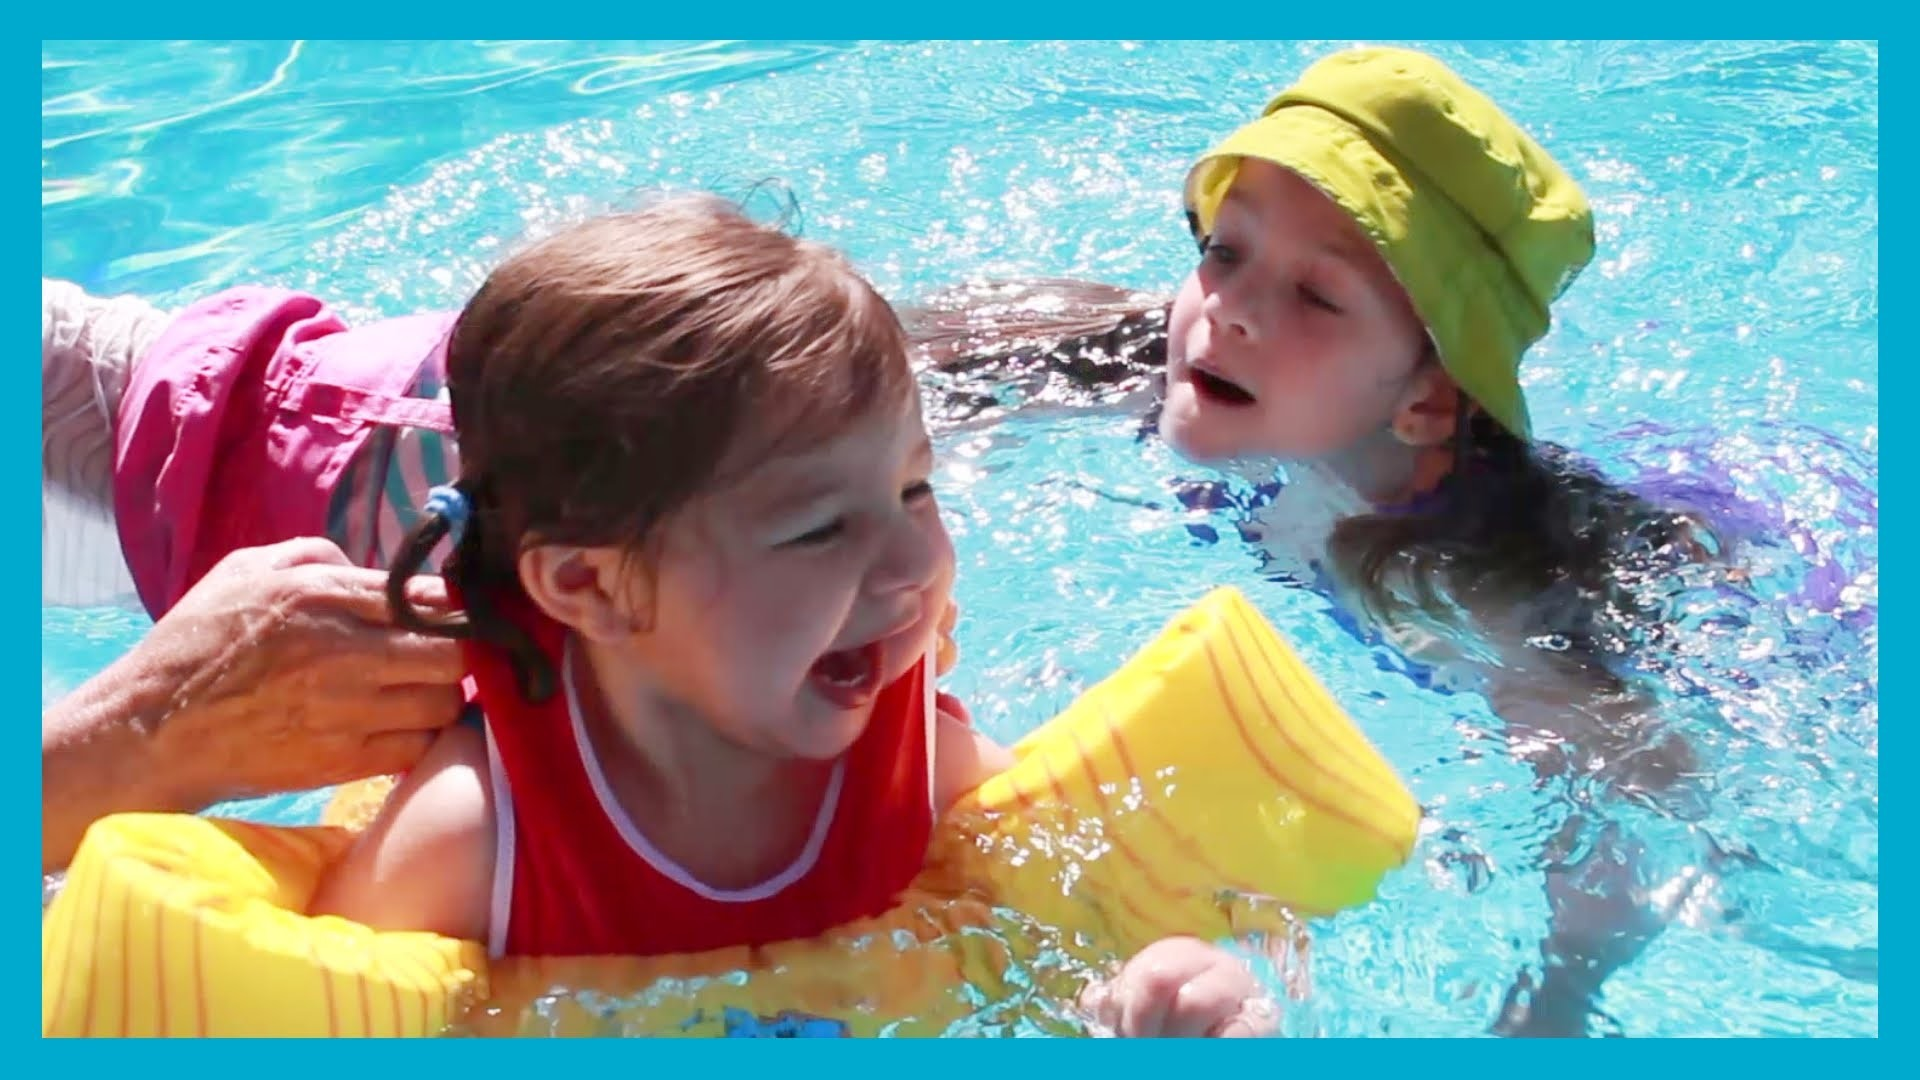 KIDS Swim In The Swimming Pool – GIRLS PLAYING VLOG- Water Gun Fight –  YOUTUBE VIDEO